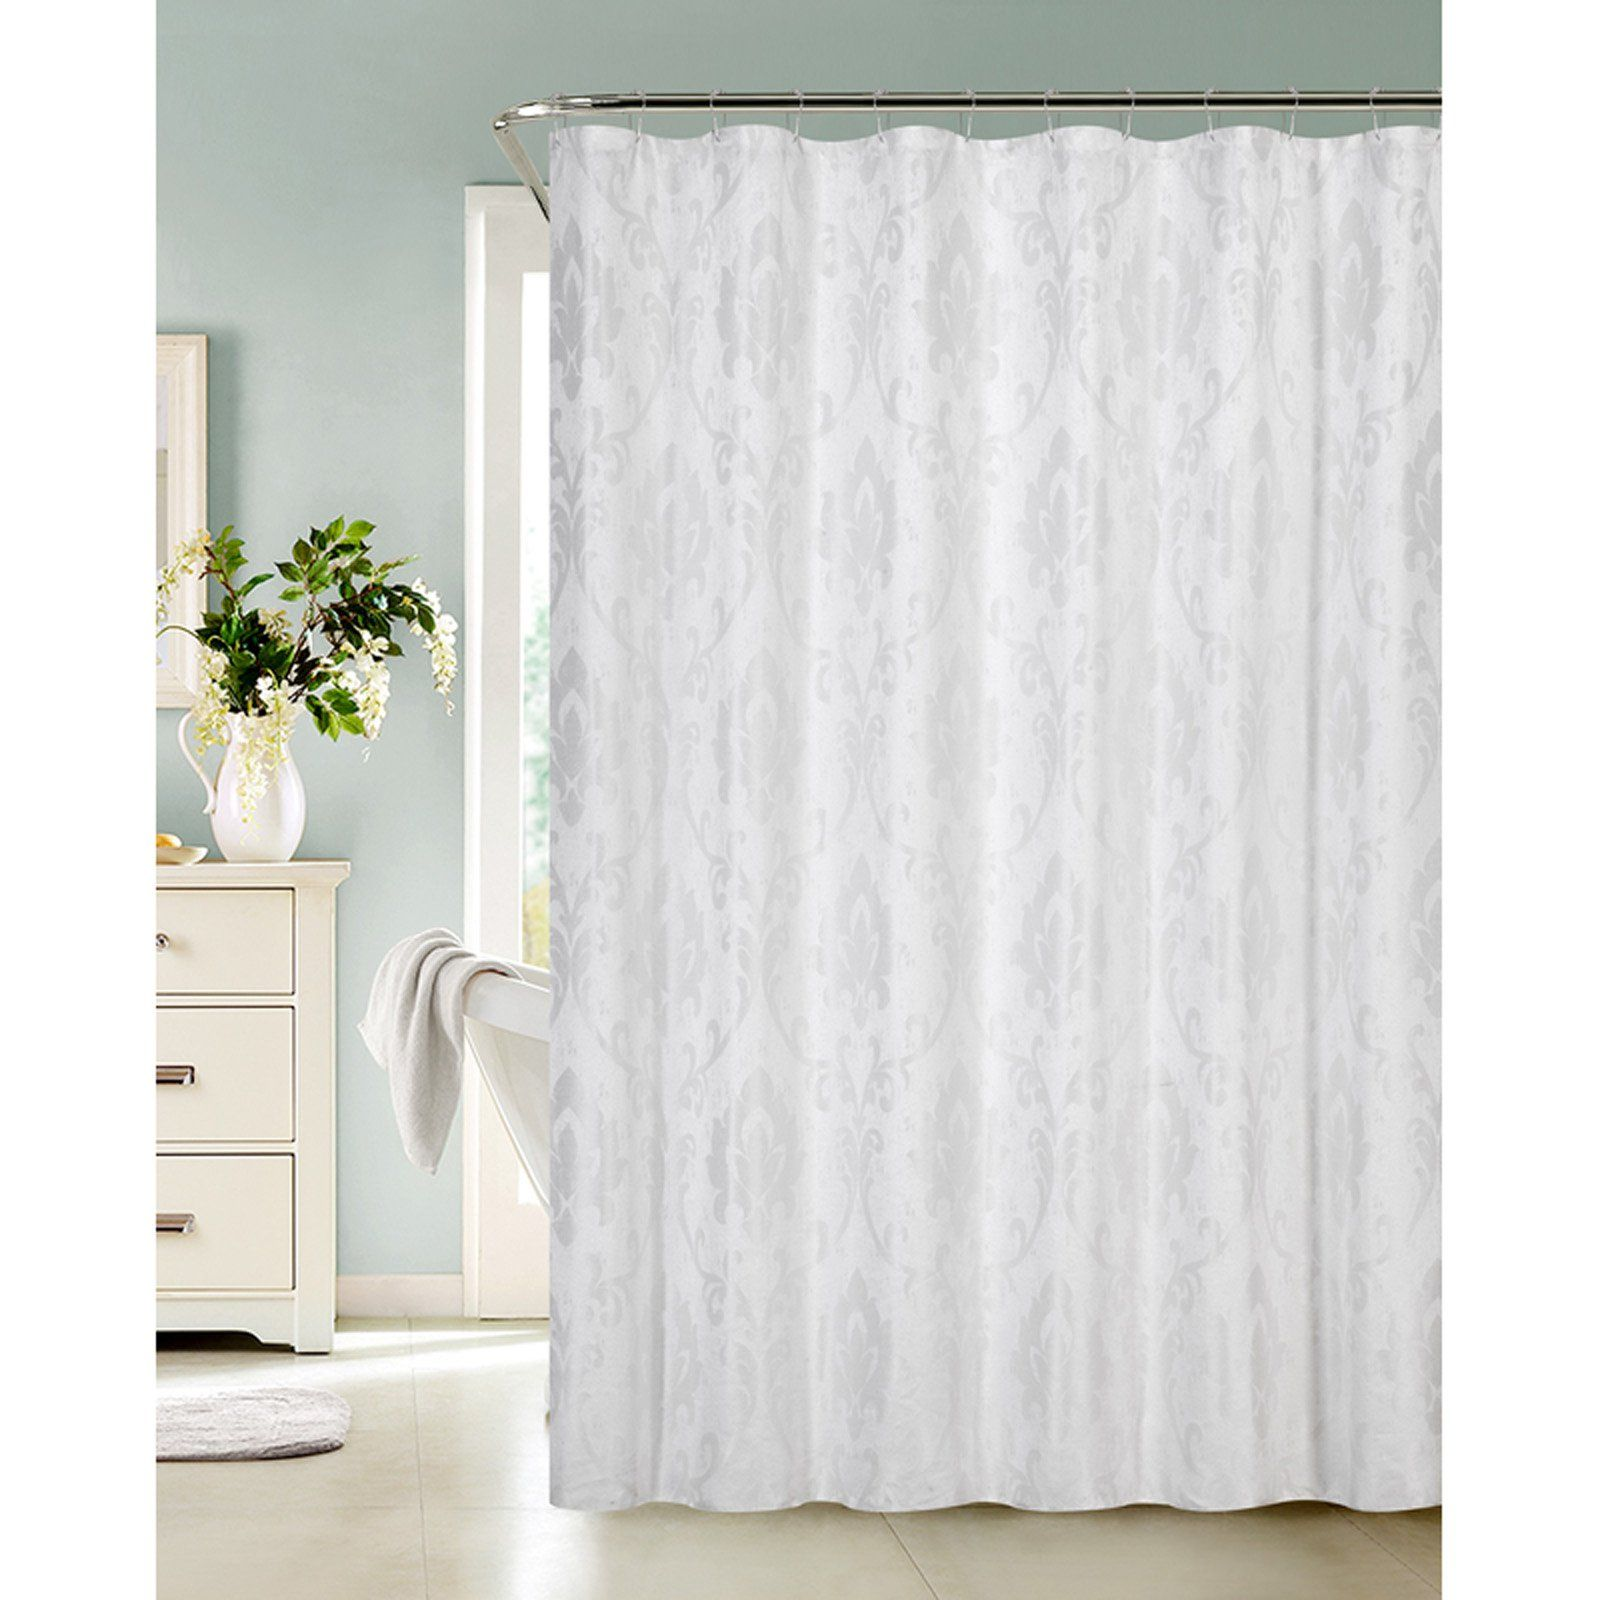 Dainty Home Vienna Shower Curtain White Fabric Shower Curtains